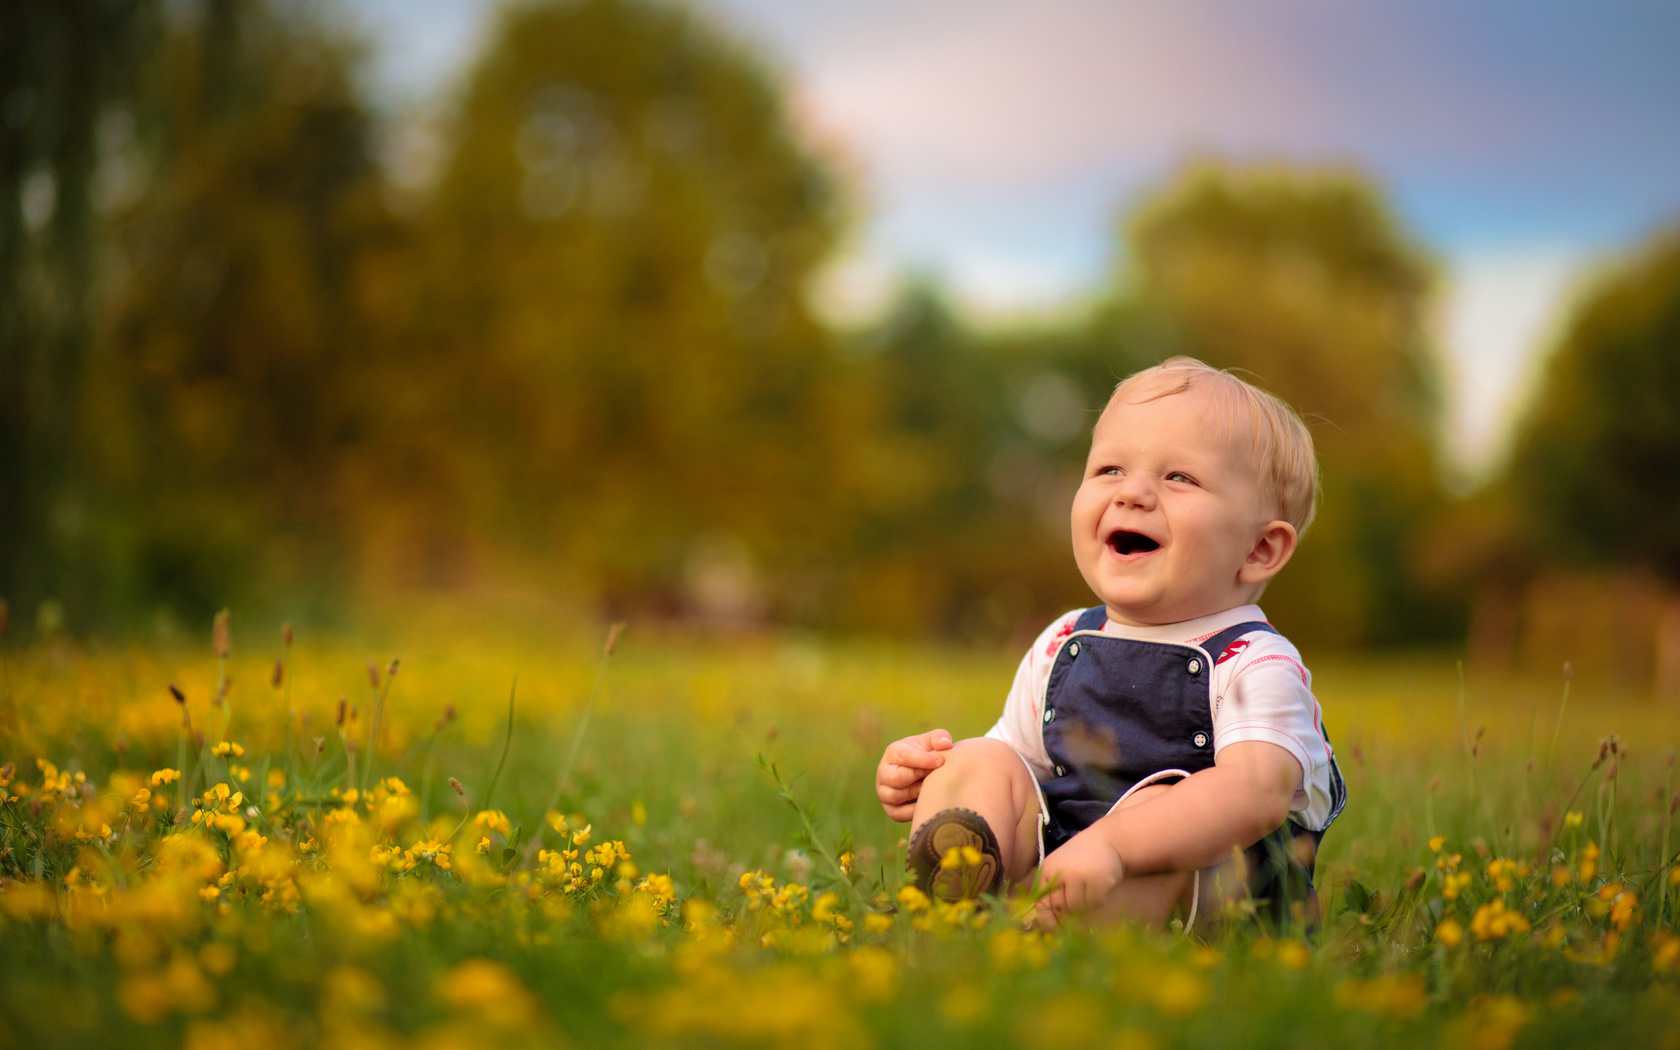 мурманчанин картинки малыш радуется мать